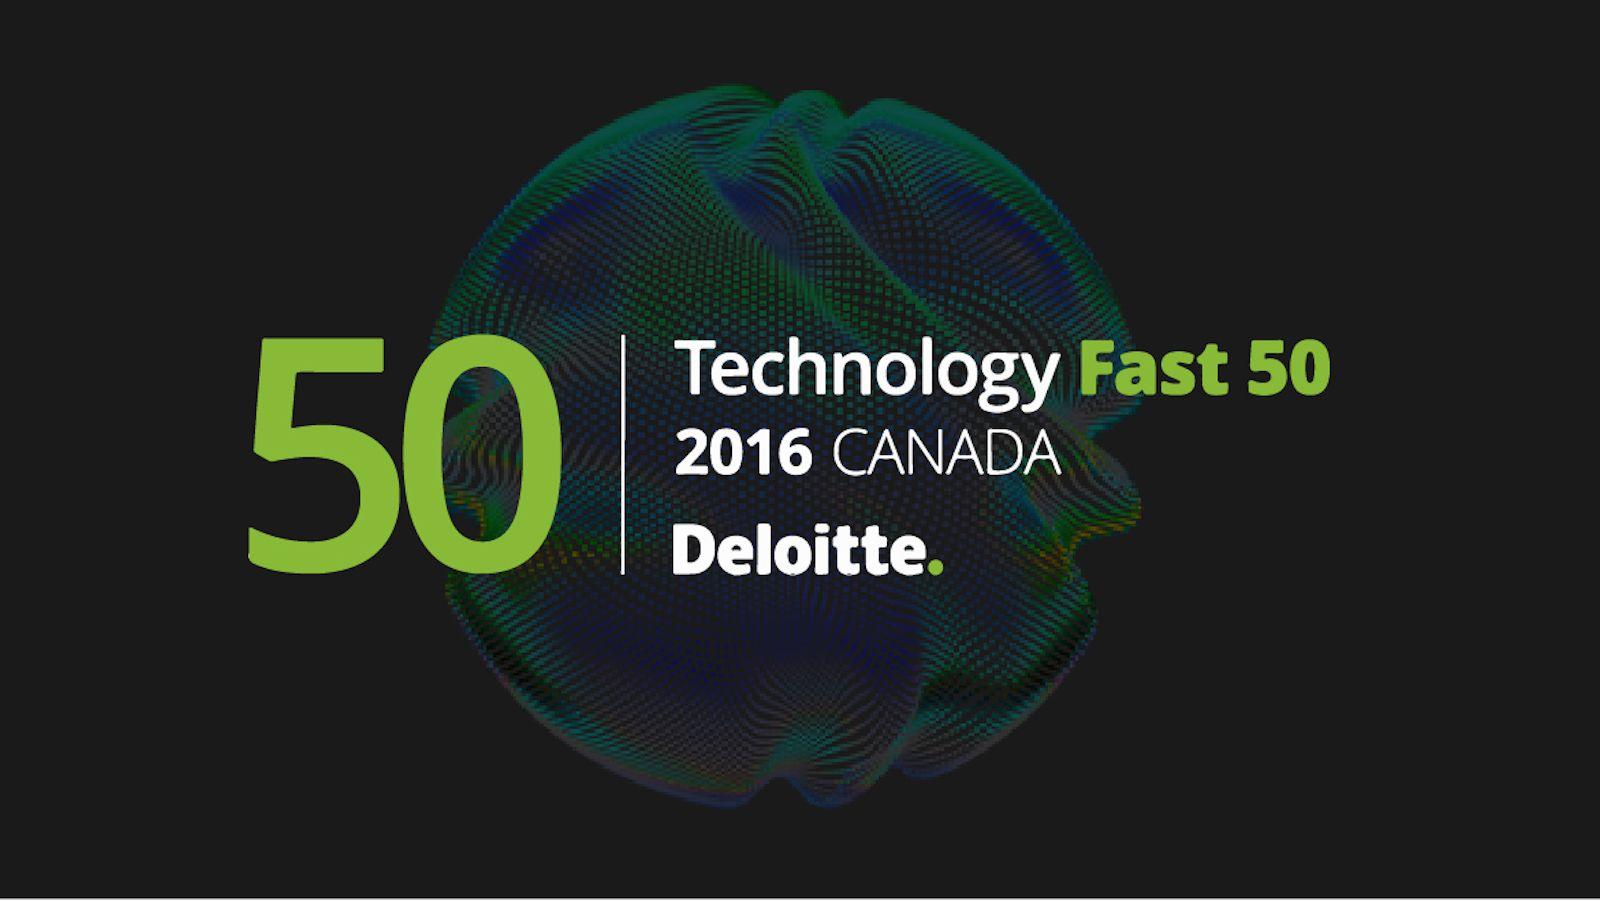 Deloitte Technology Fast 50- mobileLIVE